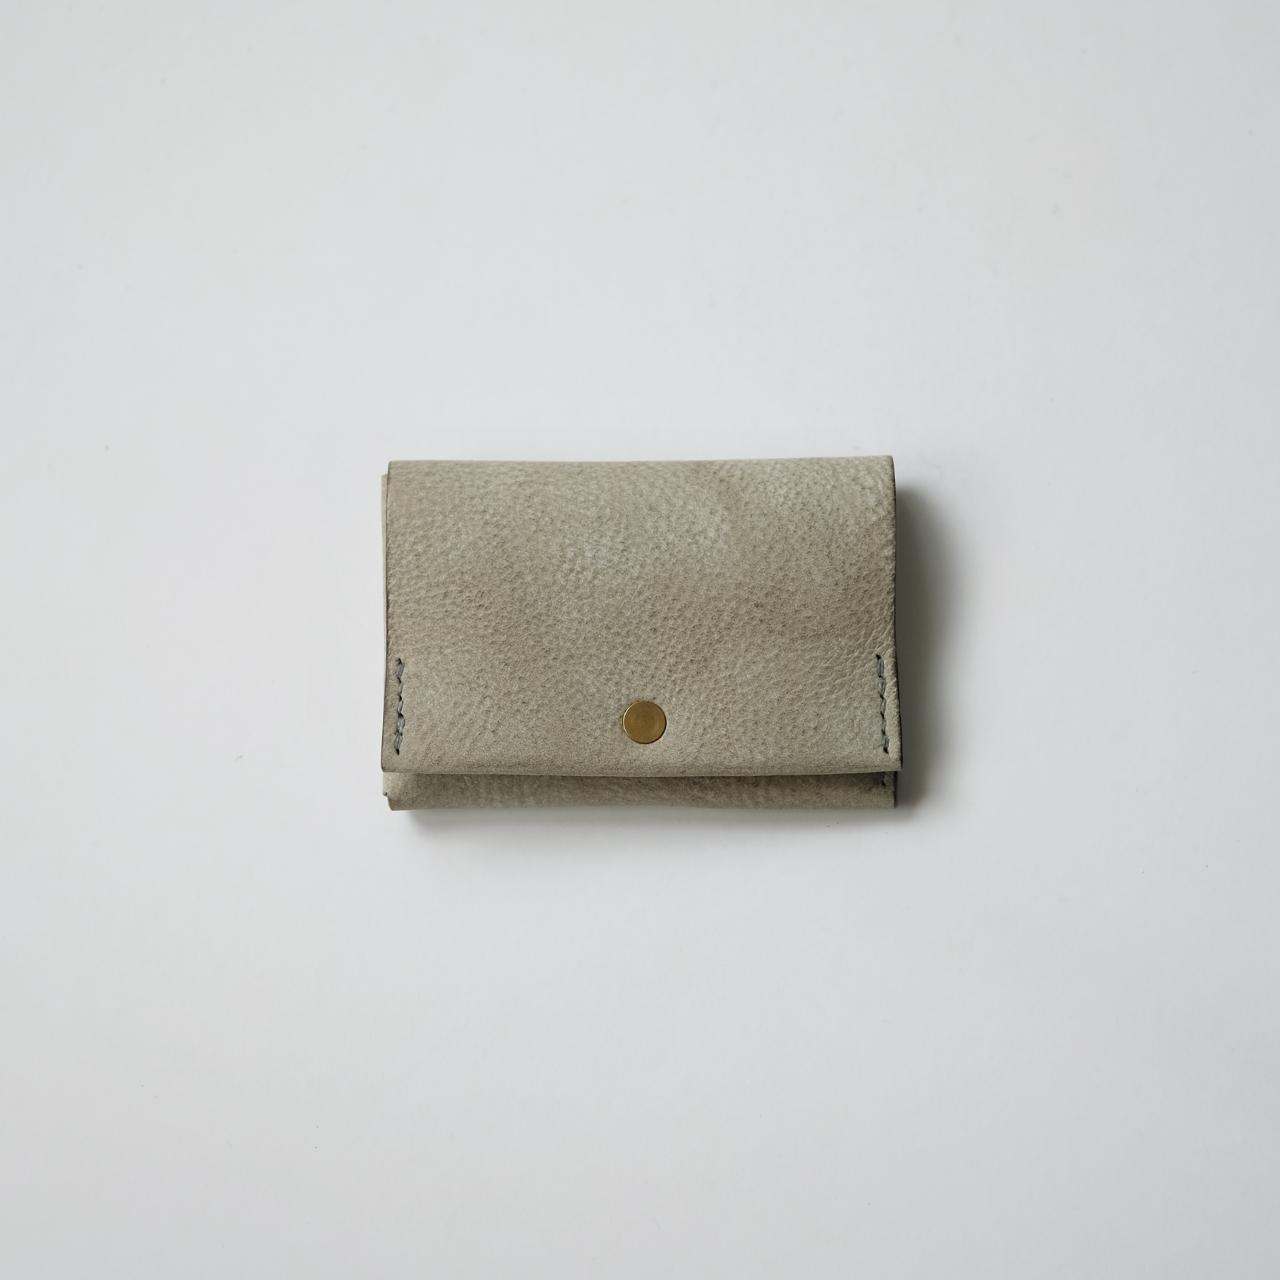 coinwallet - 02 - gray - ALASKA